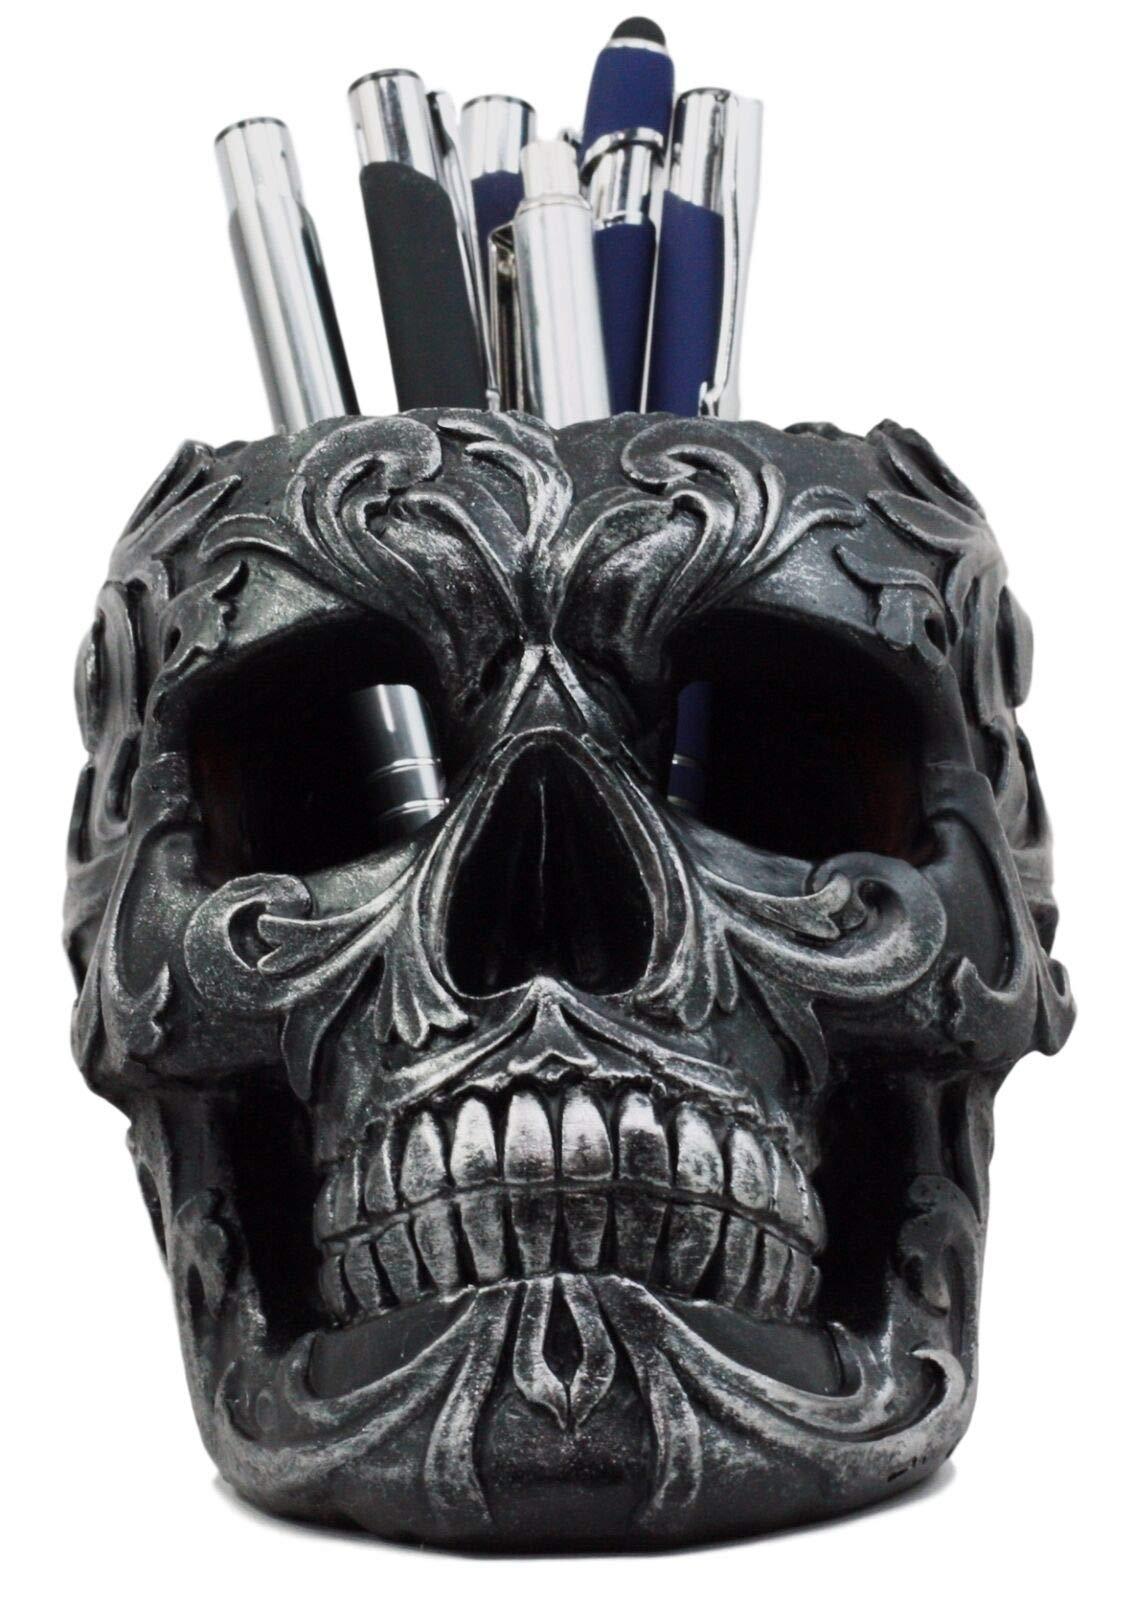 Ebros Gift Tribal Tattoo Floral Skull Pen Holder Figurine 5.75''L Office Desktop Ossuary Skulls Decor Cranium Skeleton Head Stationery Holder As Halloween Macabre Graveyard Spooky Decorative Statue by Ebros Gift